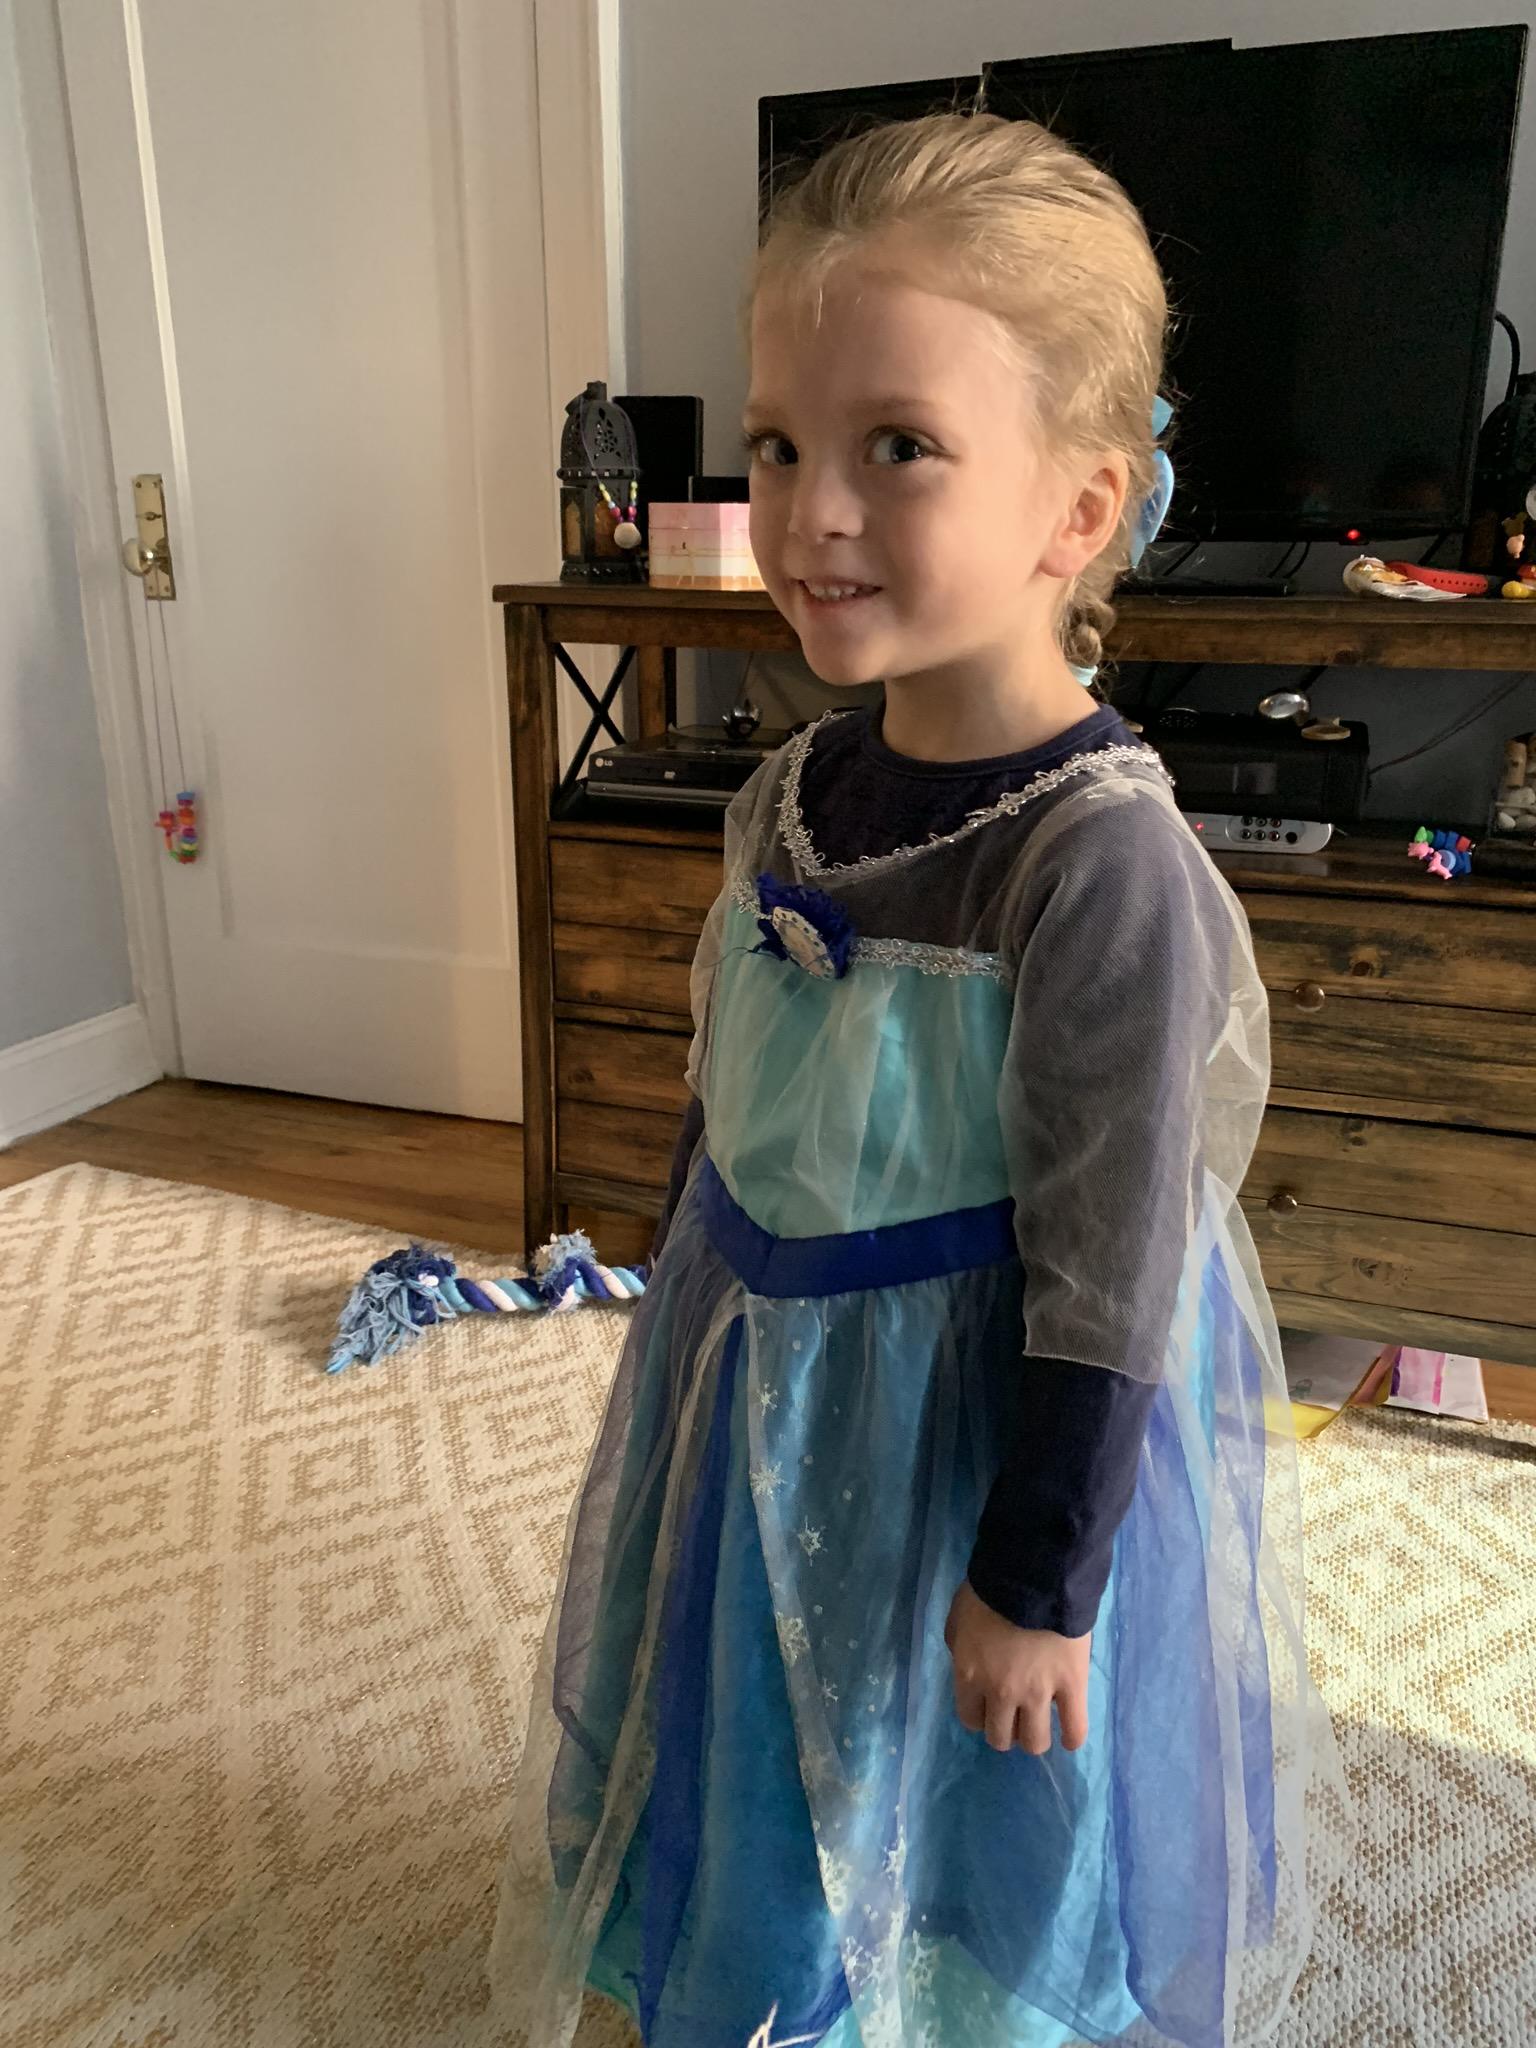 Elsa ready to go visit her little sister